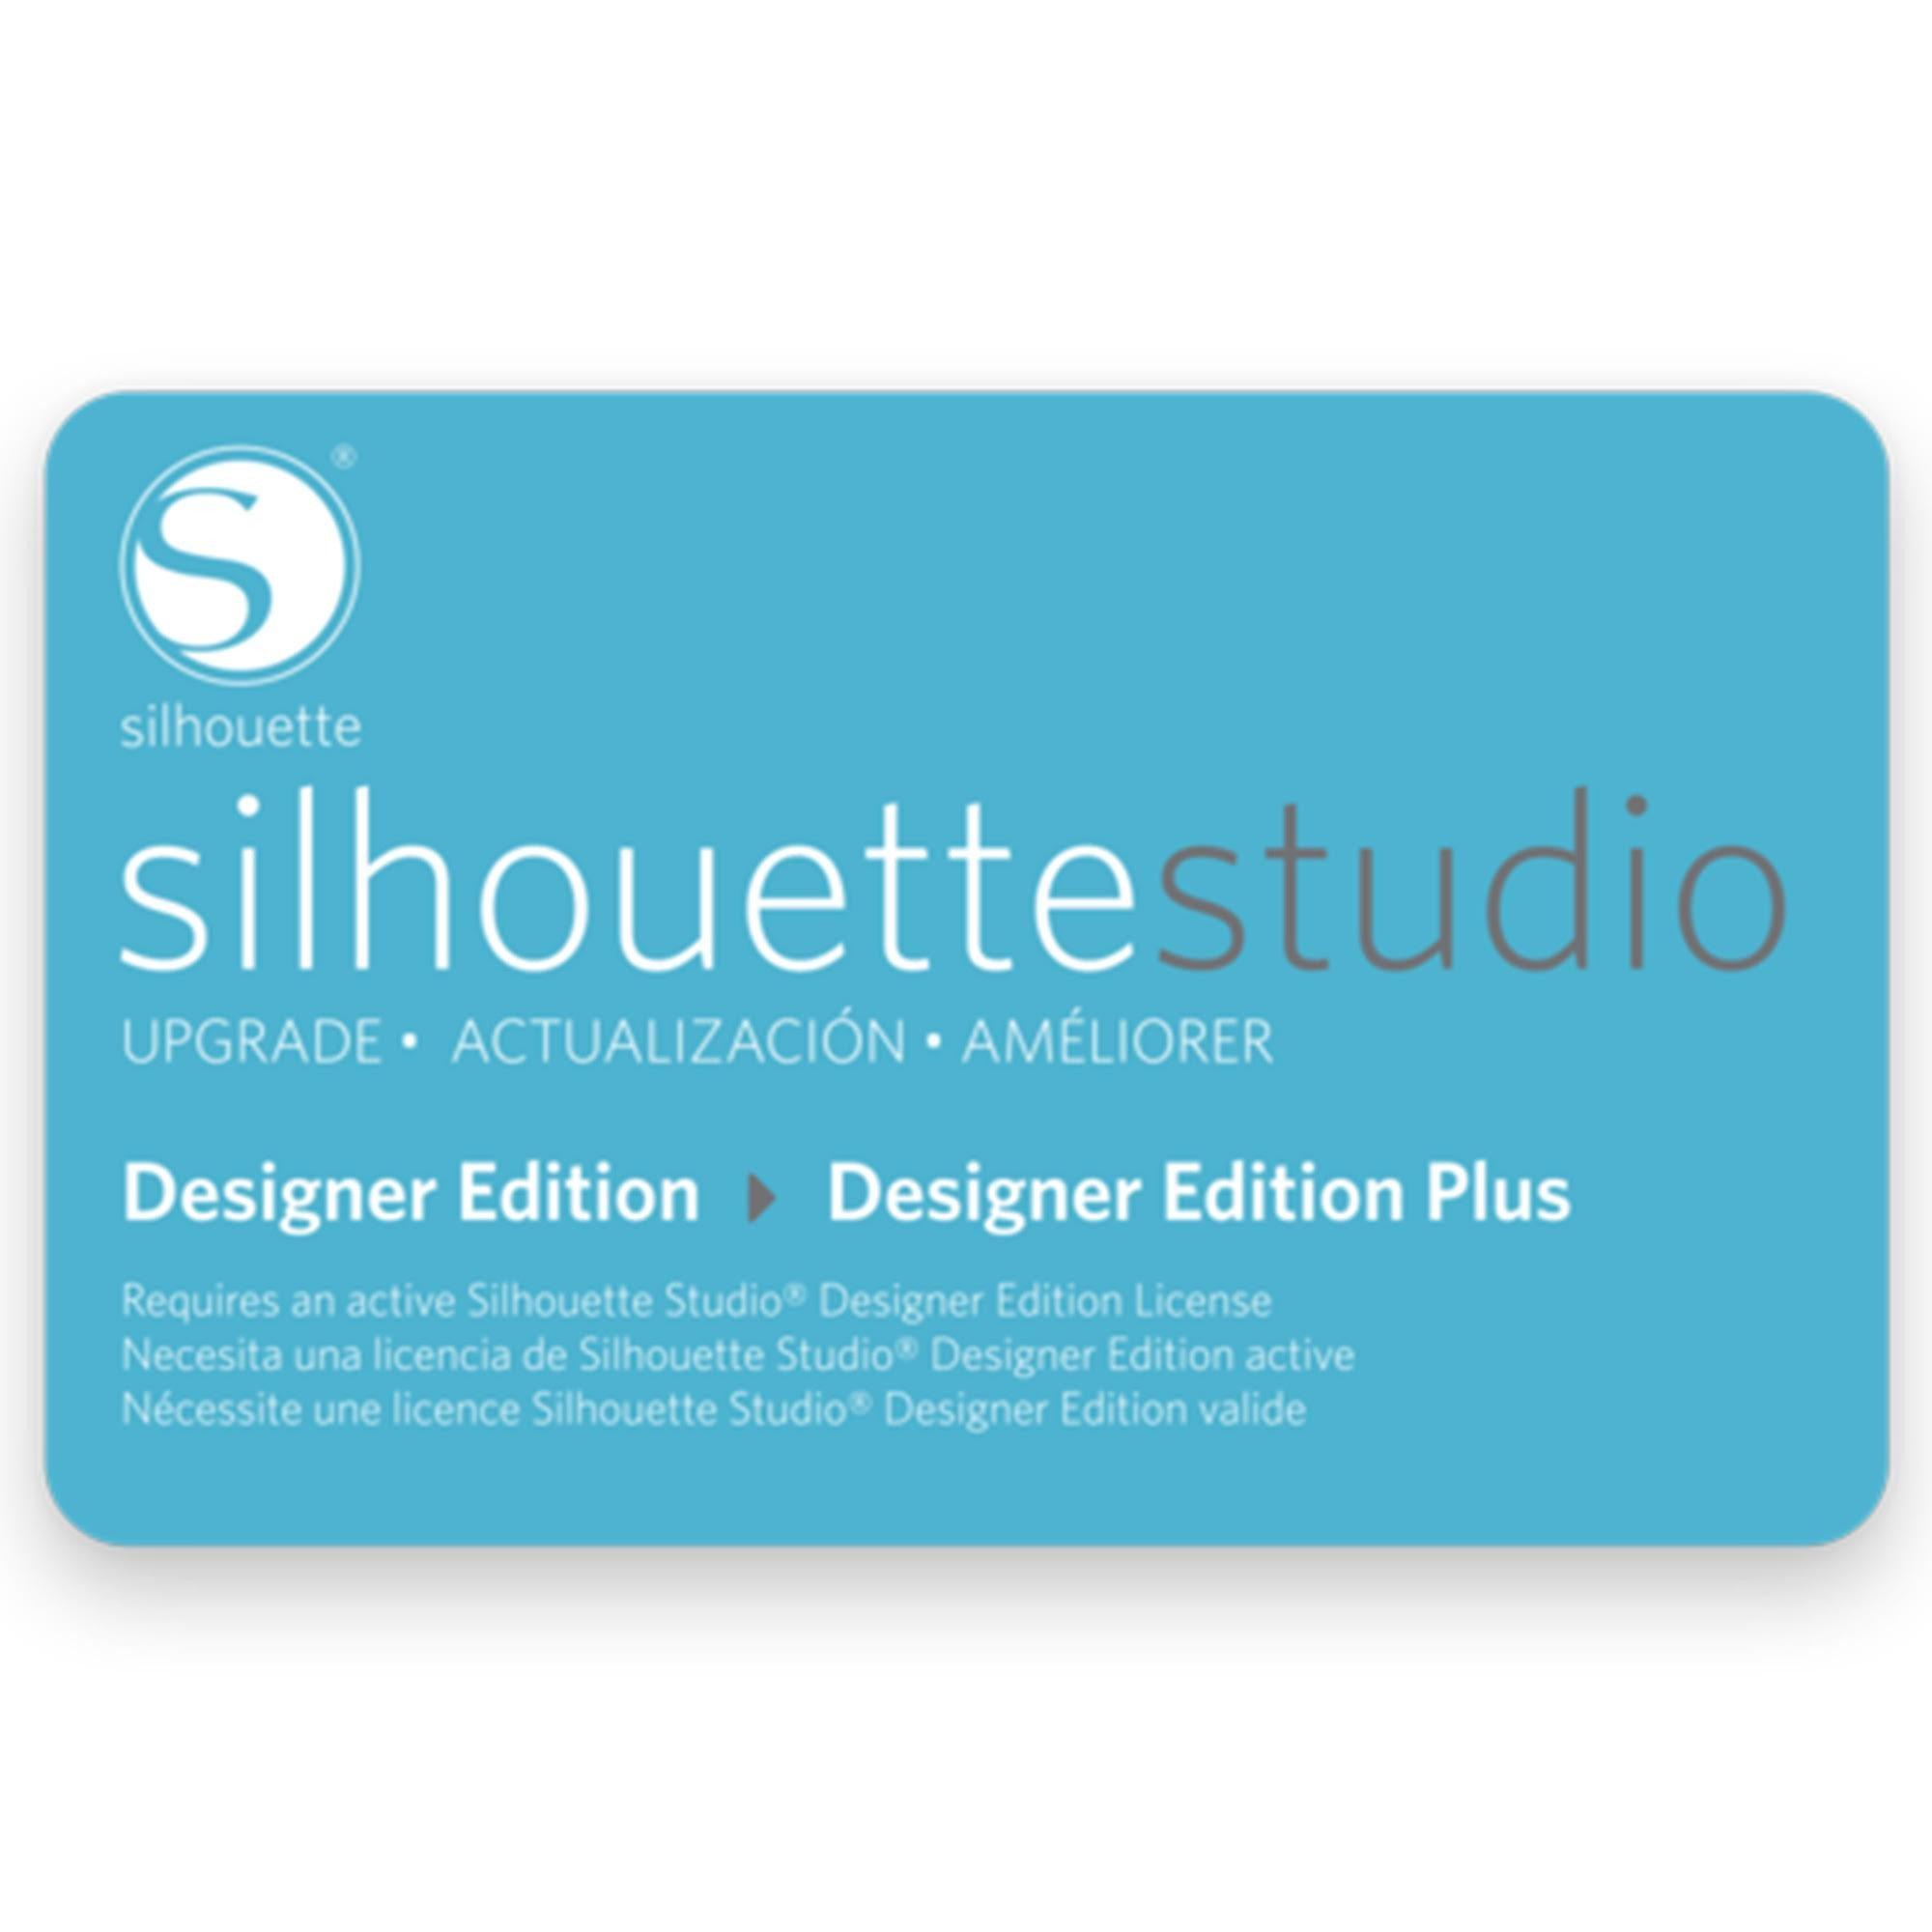 Silhouette Studio Free Download